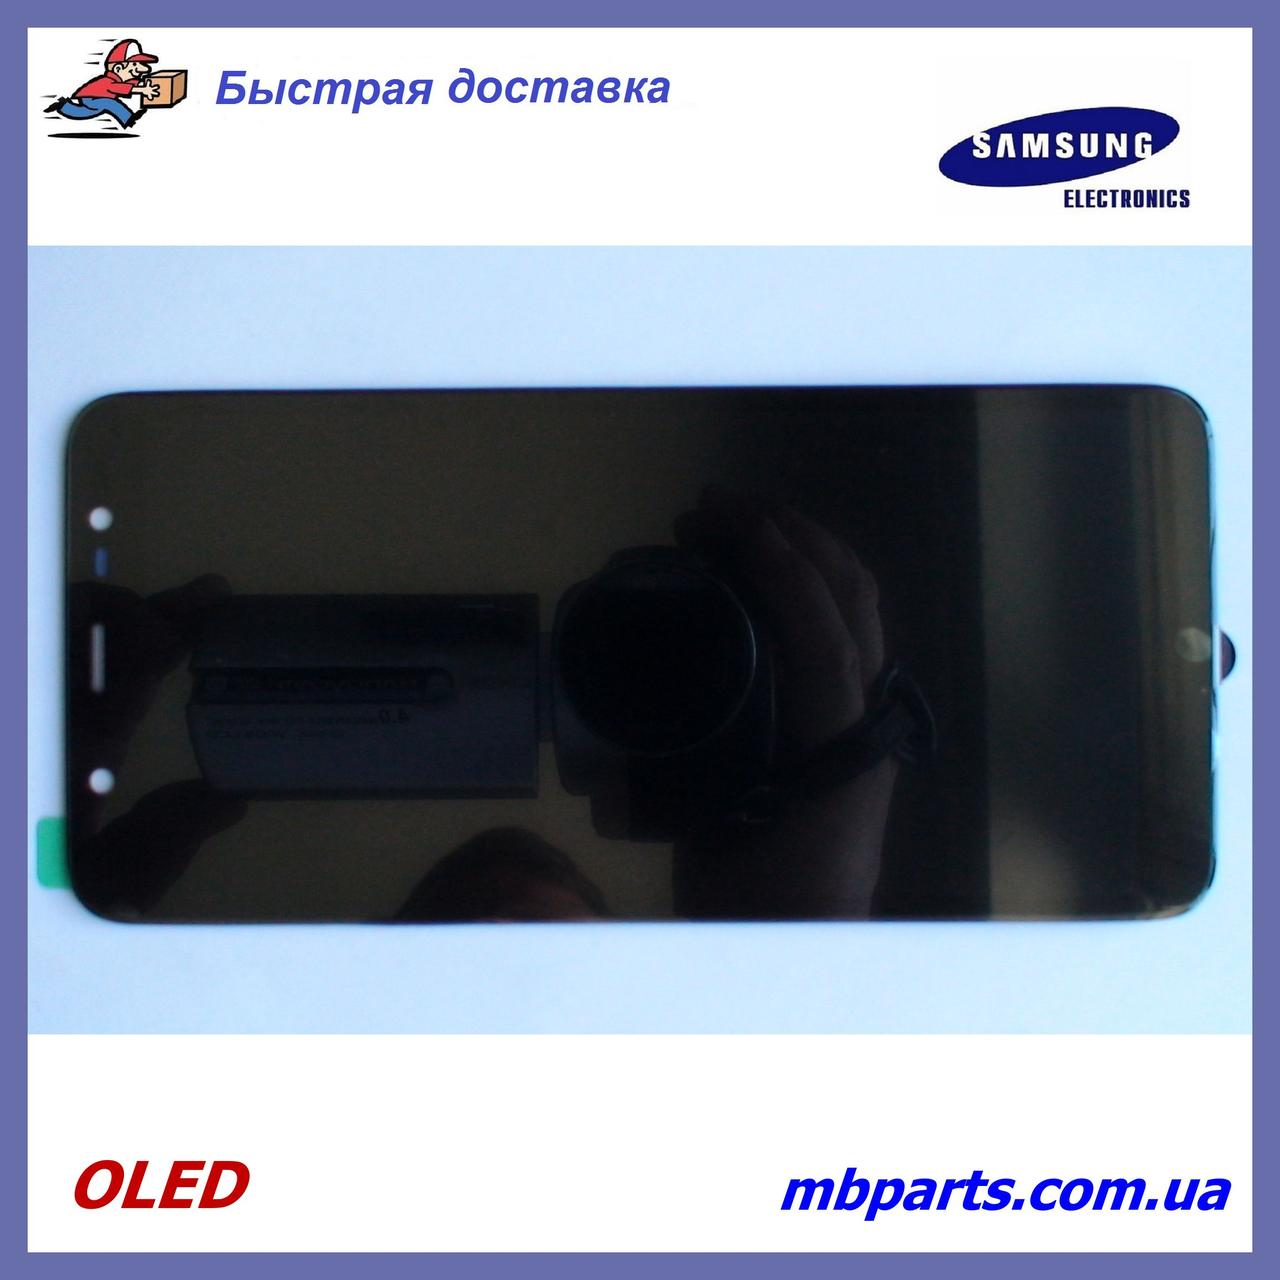 Дисплей з сенсором Samsung J810 Galaxy J8 2018 OLED Black !